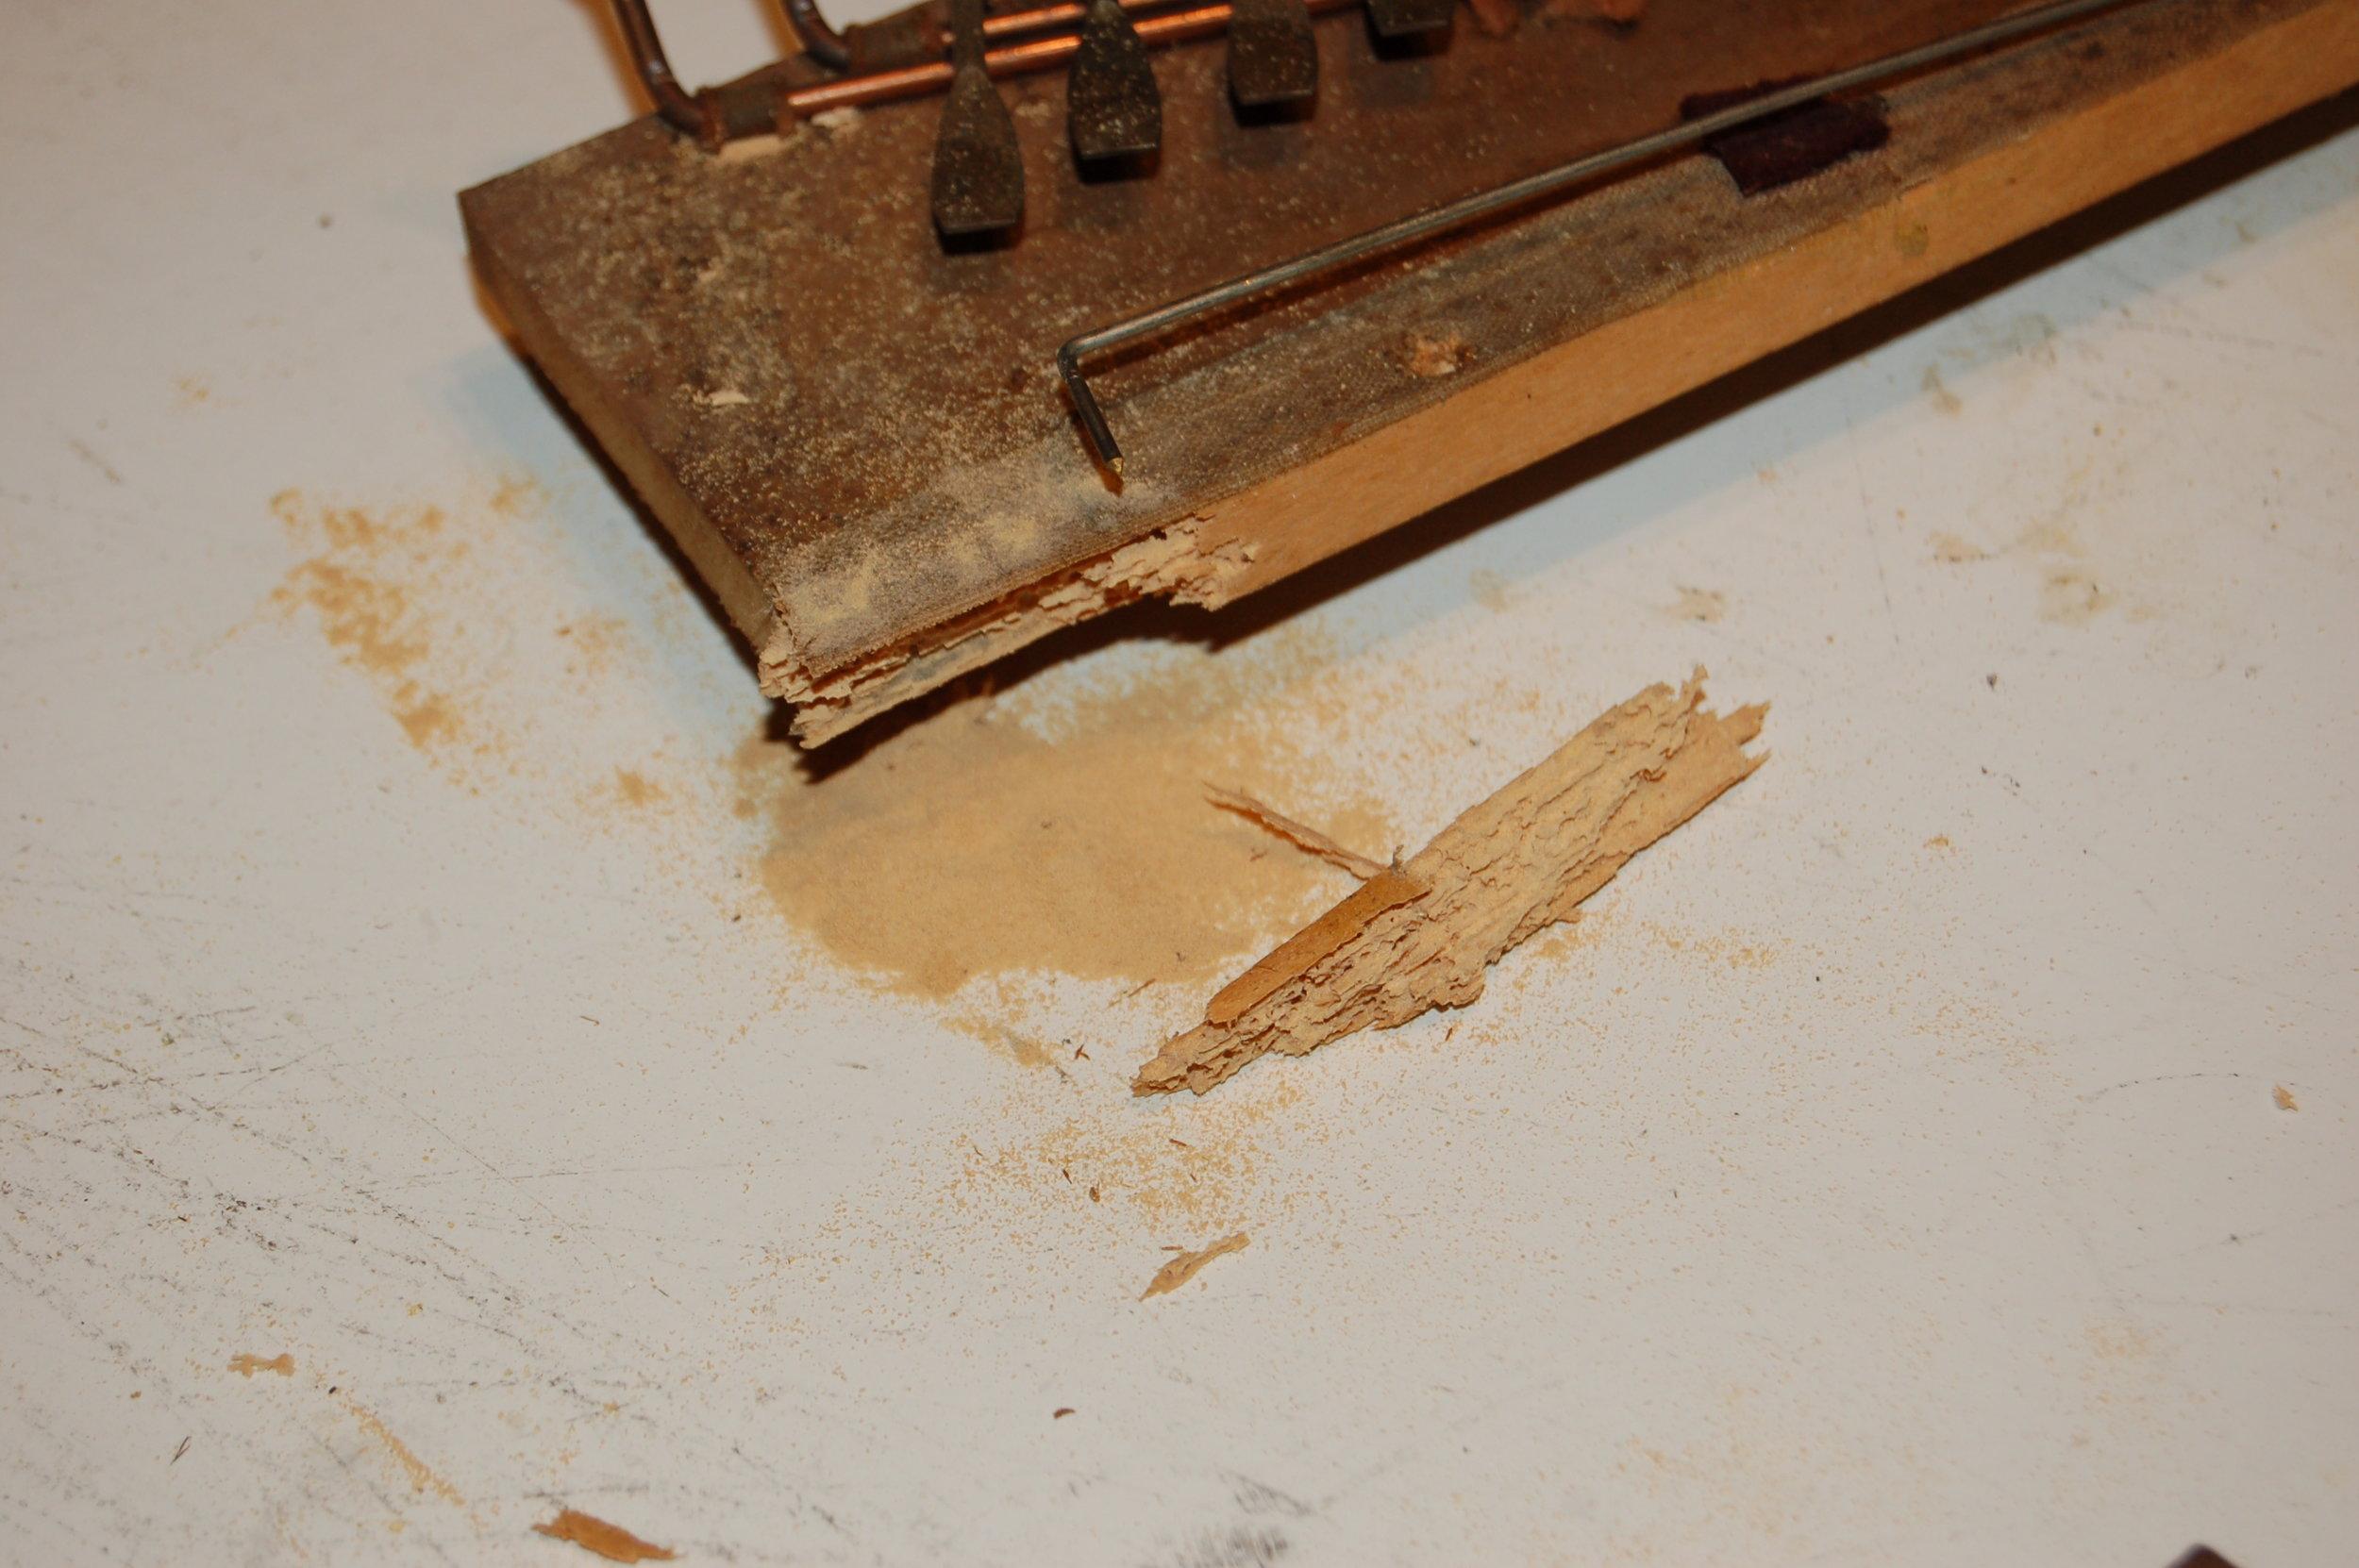 Crumbling coupler hinge